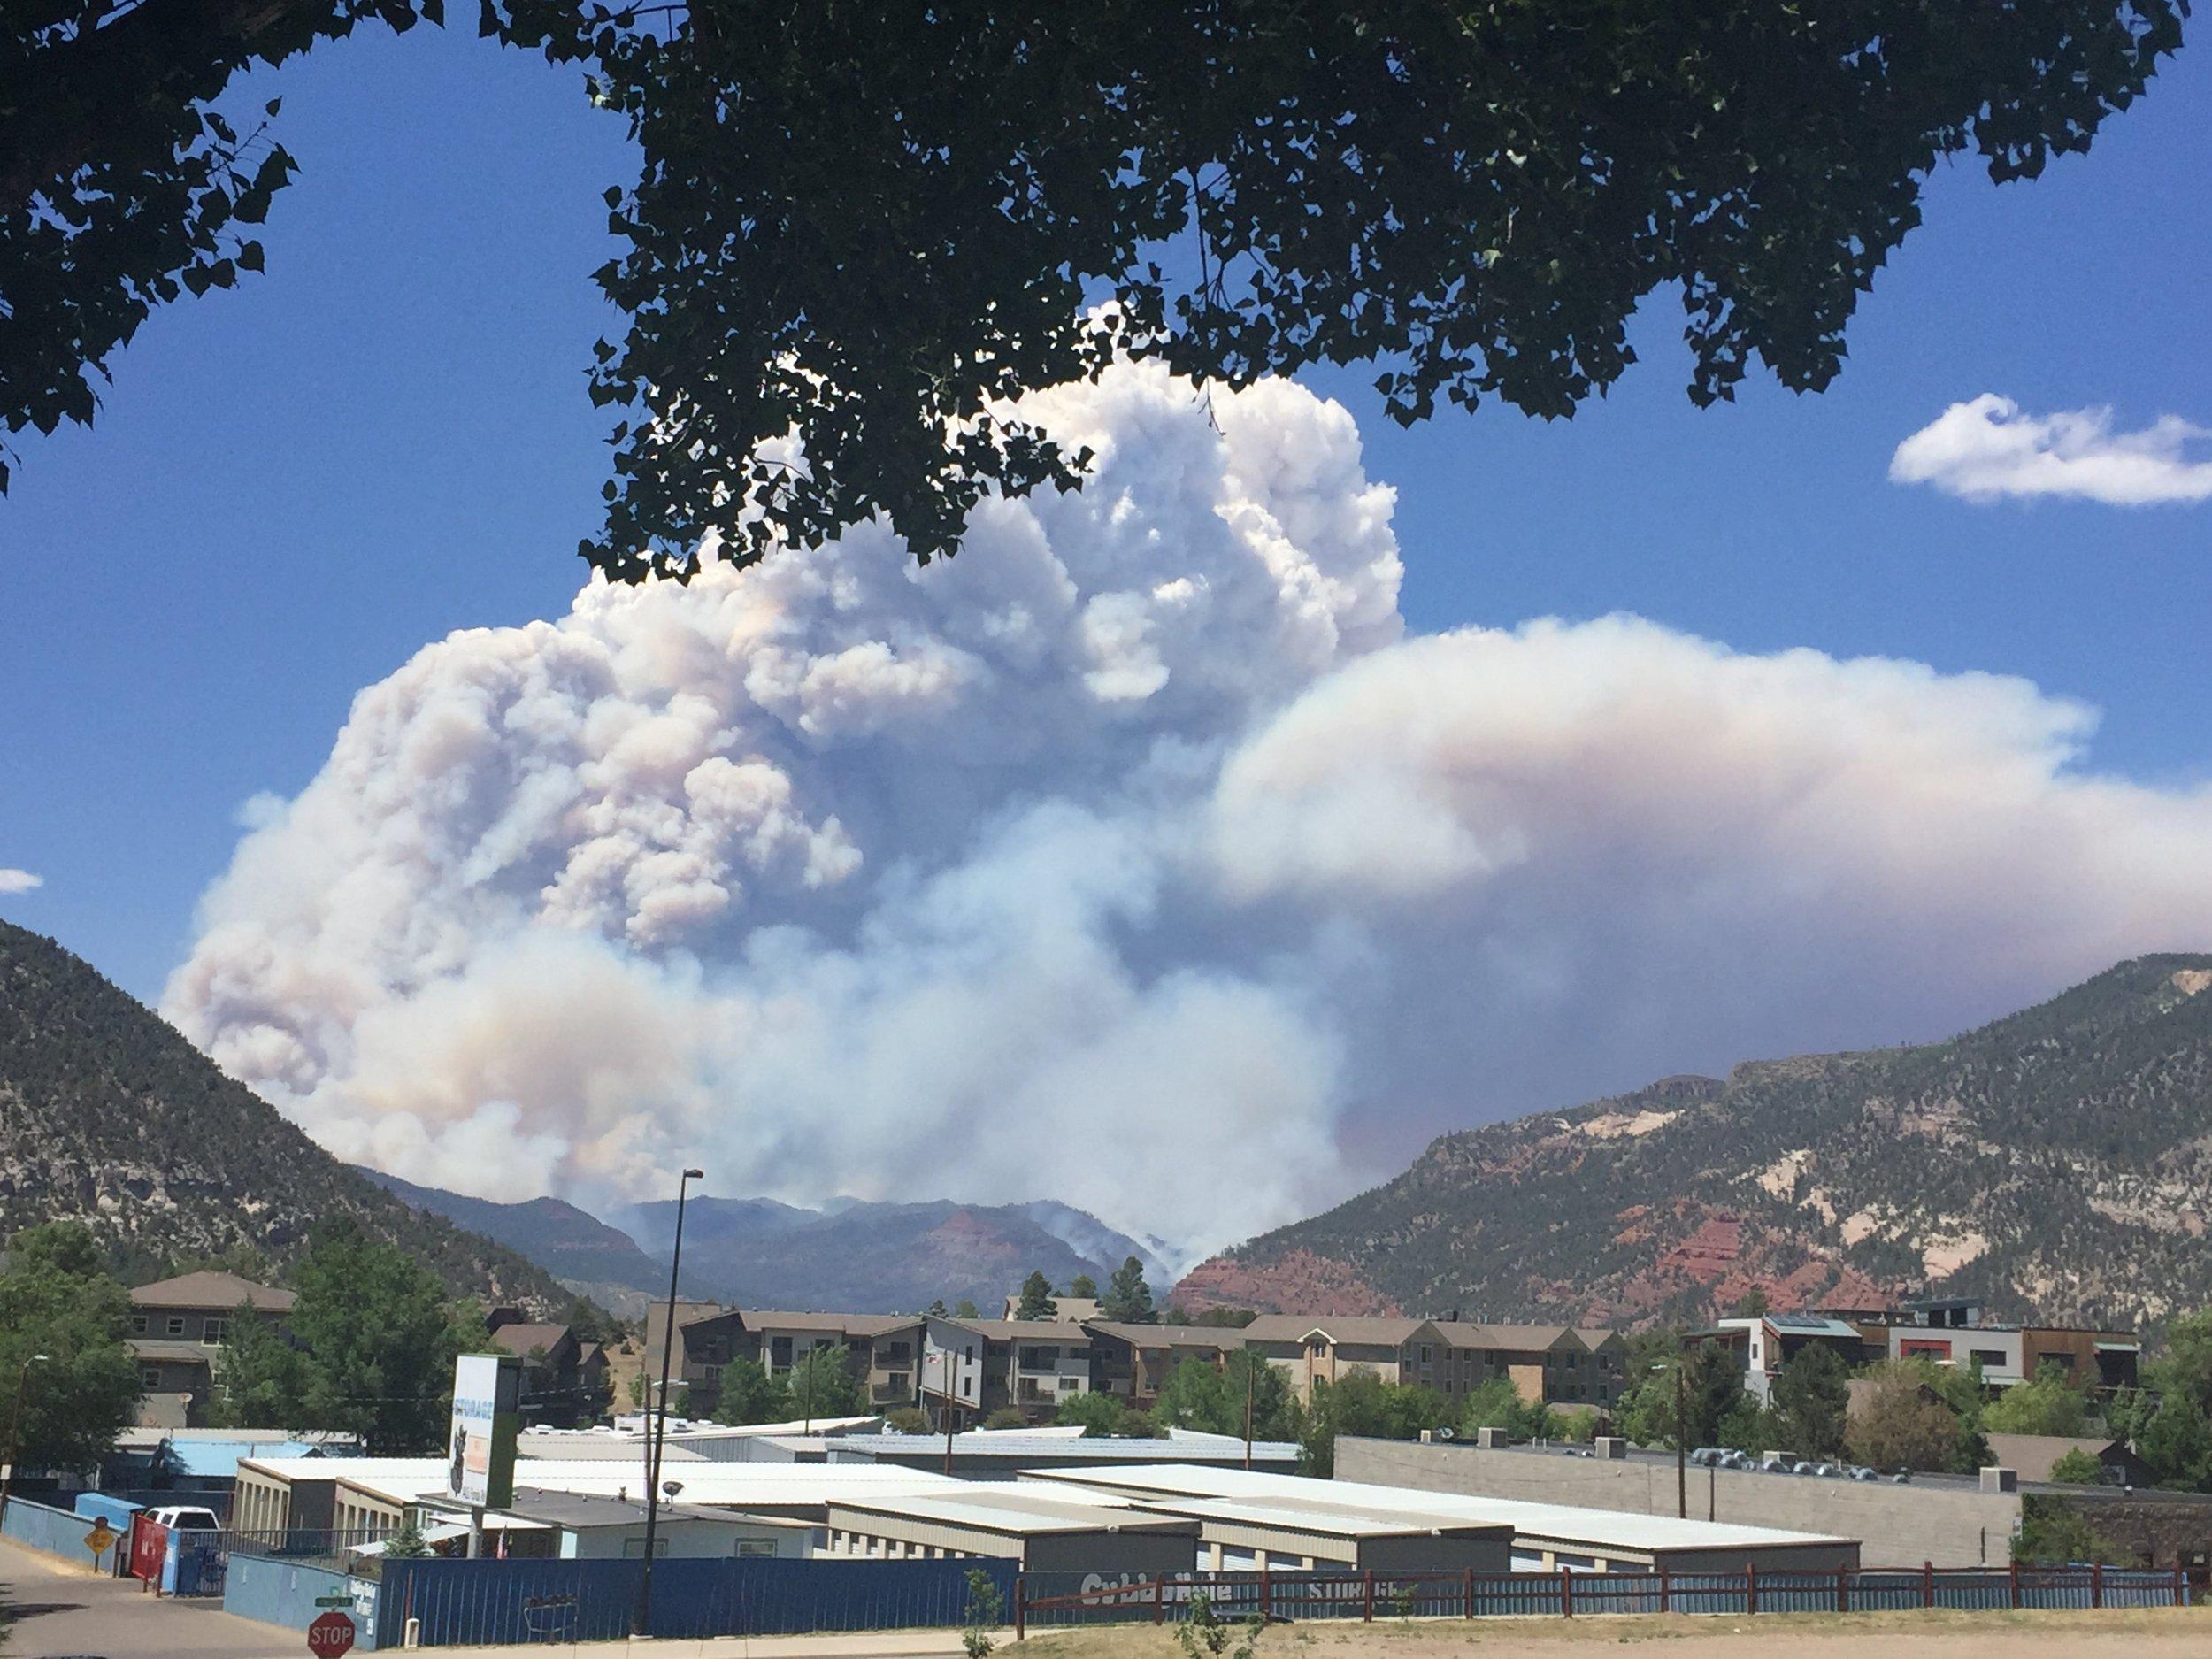 Smoke from the 416 fire above Durango, CO. Photo:Lori Zazzaro, SJBH